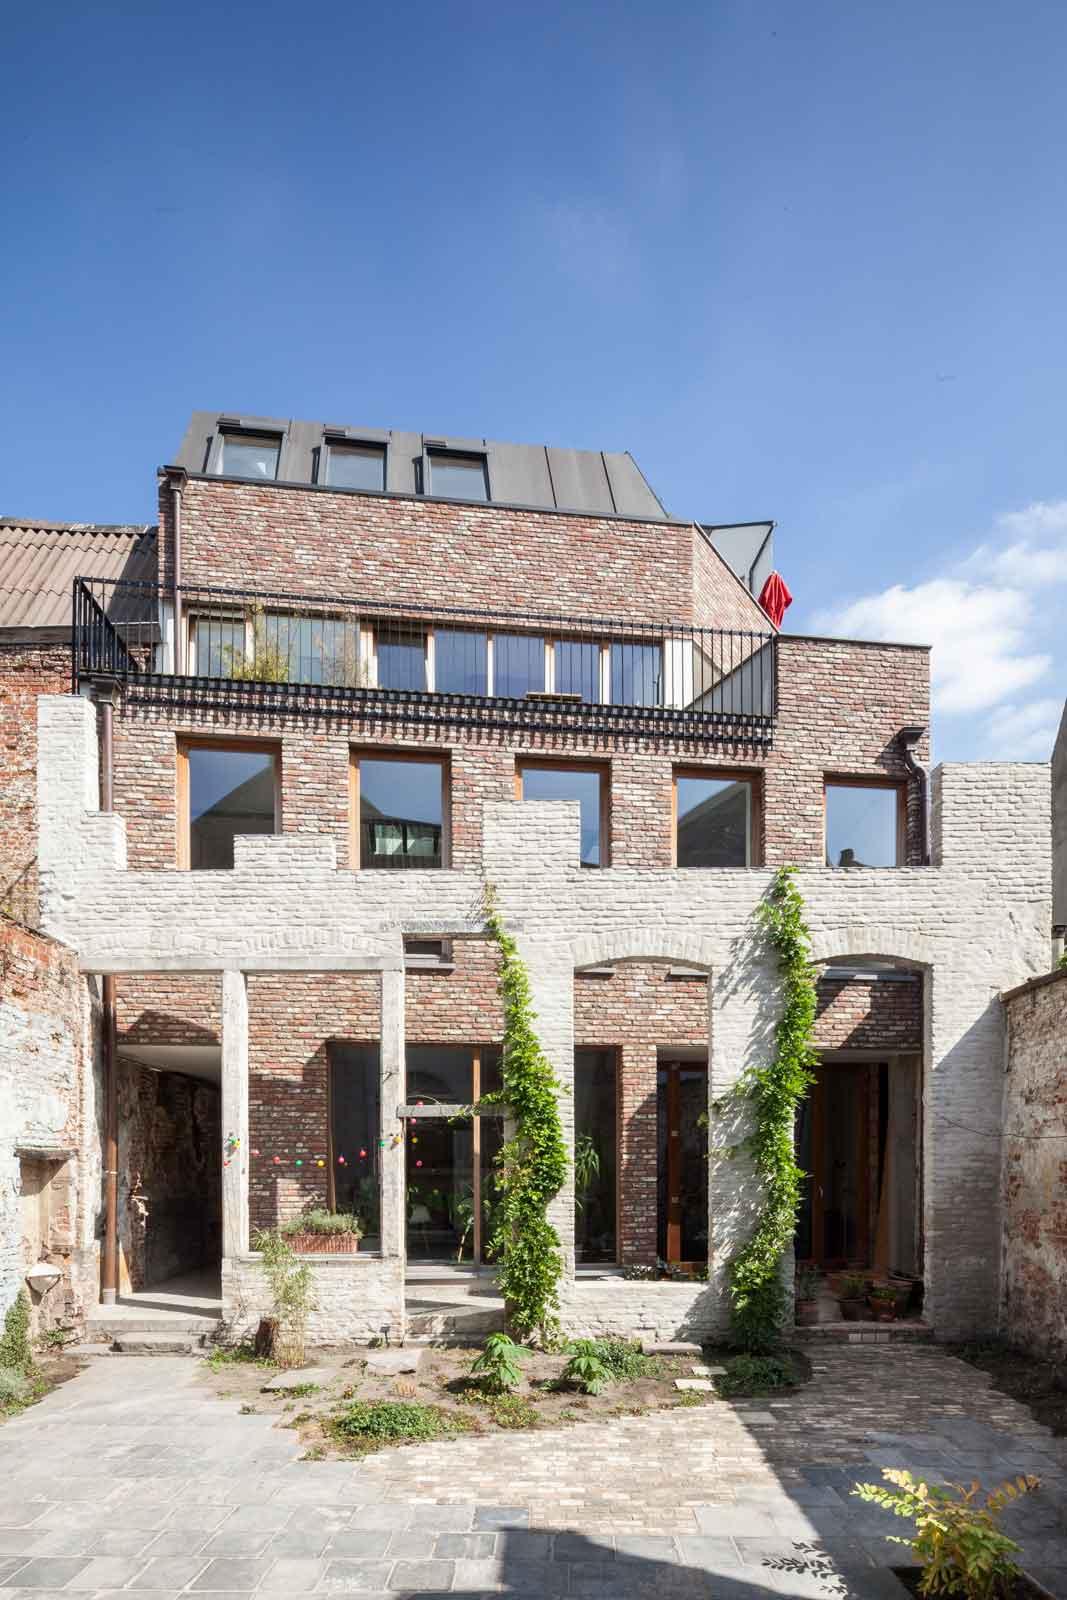 Gewad in Ghent, Belgium by Atelier Vens Vanbelle | Yellowtrace